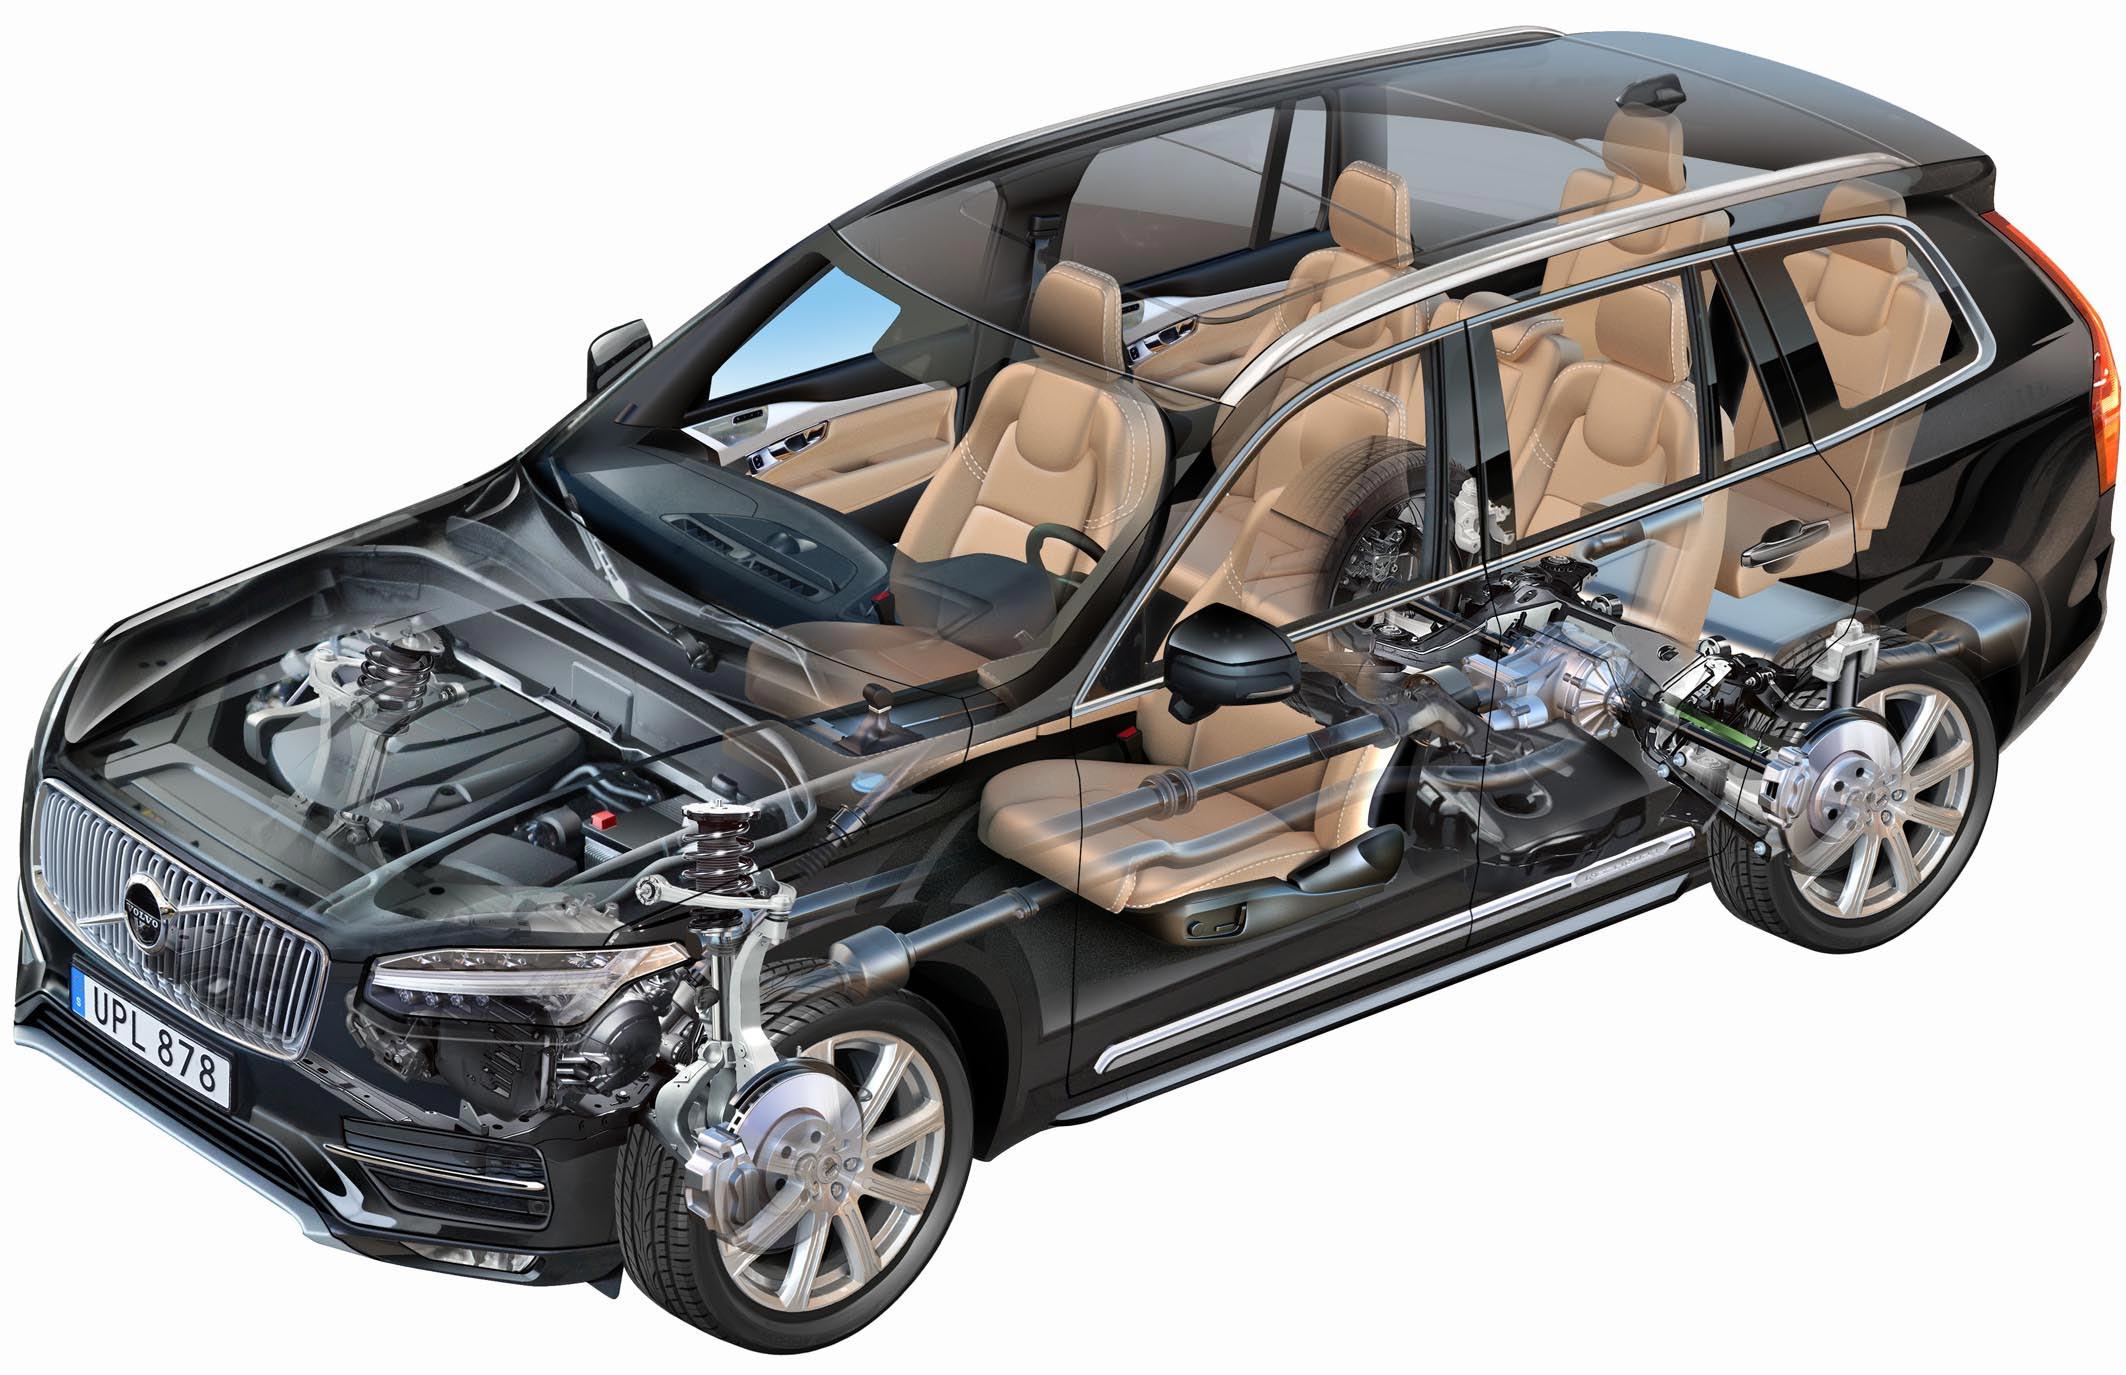 Volvo XC90 cutaway